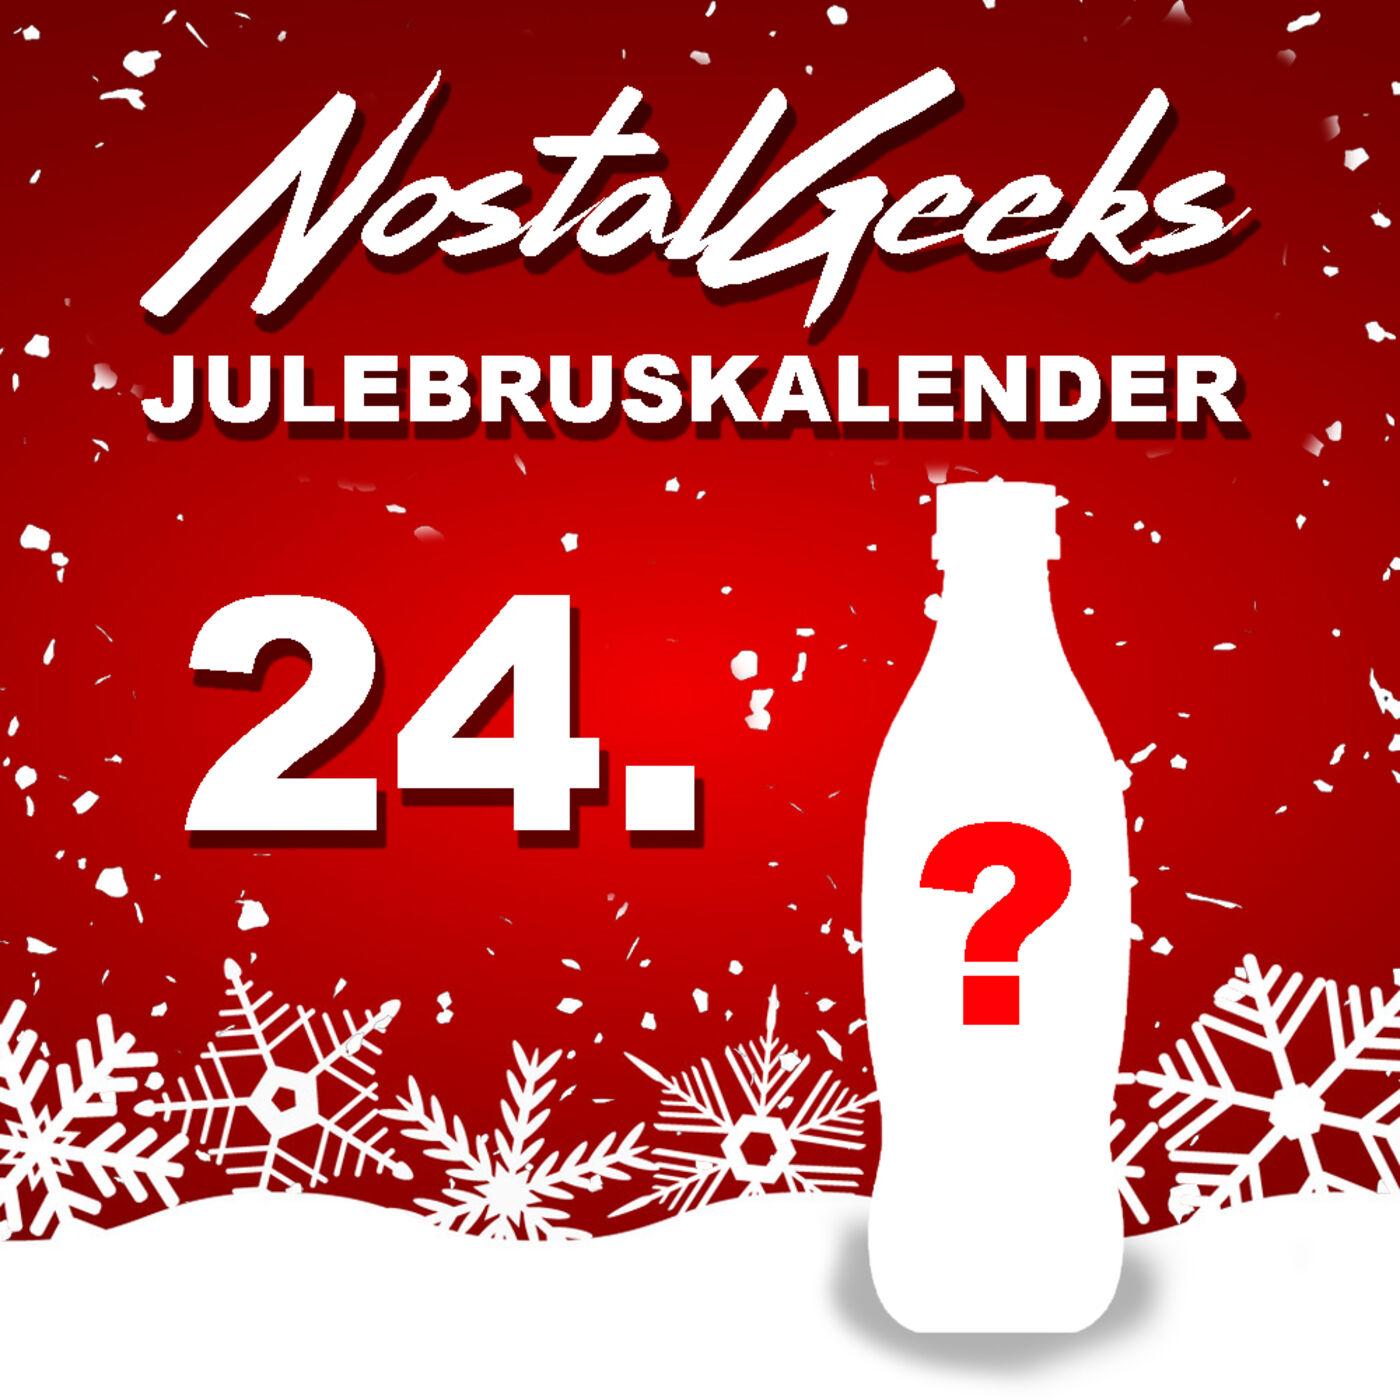 NostalGeeks Julebruskalender - 24 - Den Ultimate Julebrusen